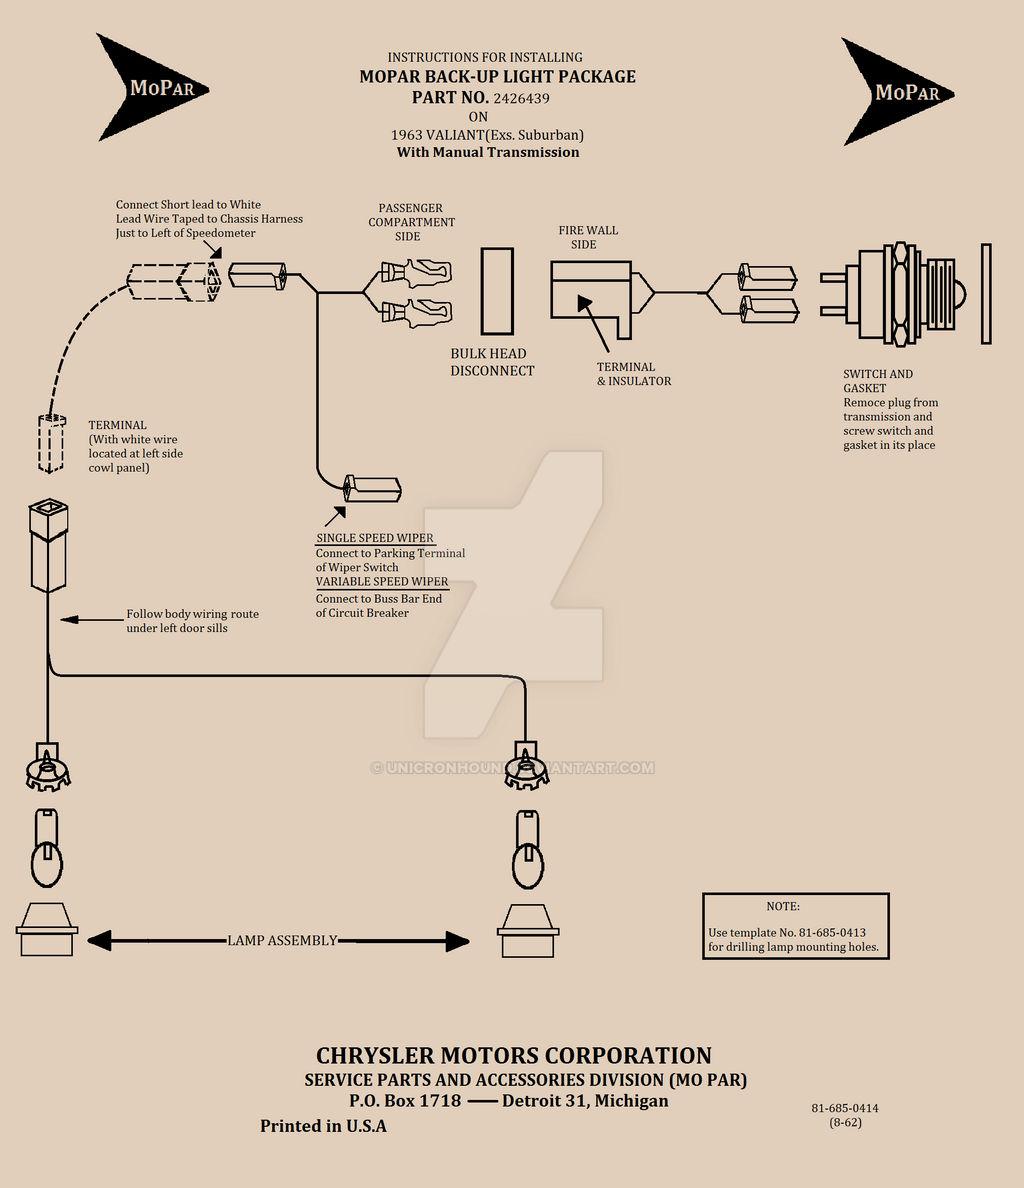 Wiring diagram 1963 Valiant reverse Lights by UnicronHound ... on